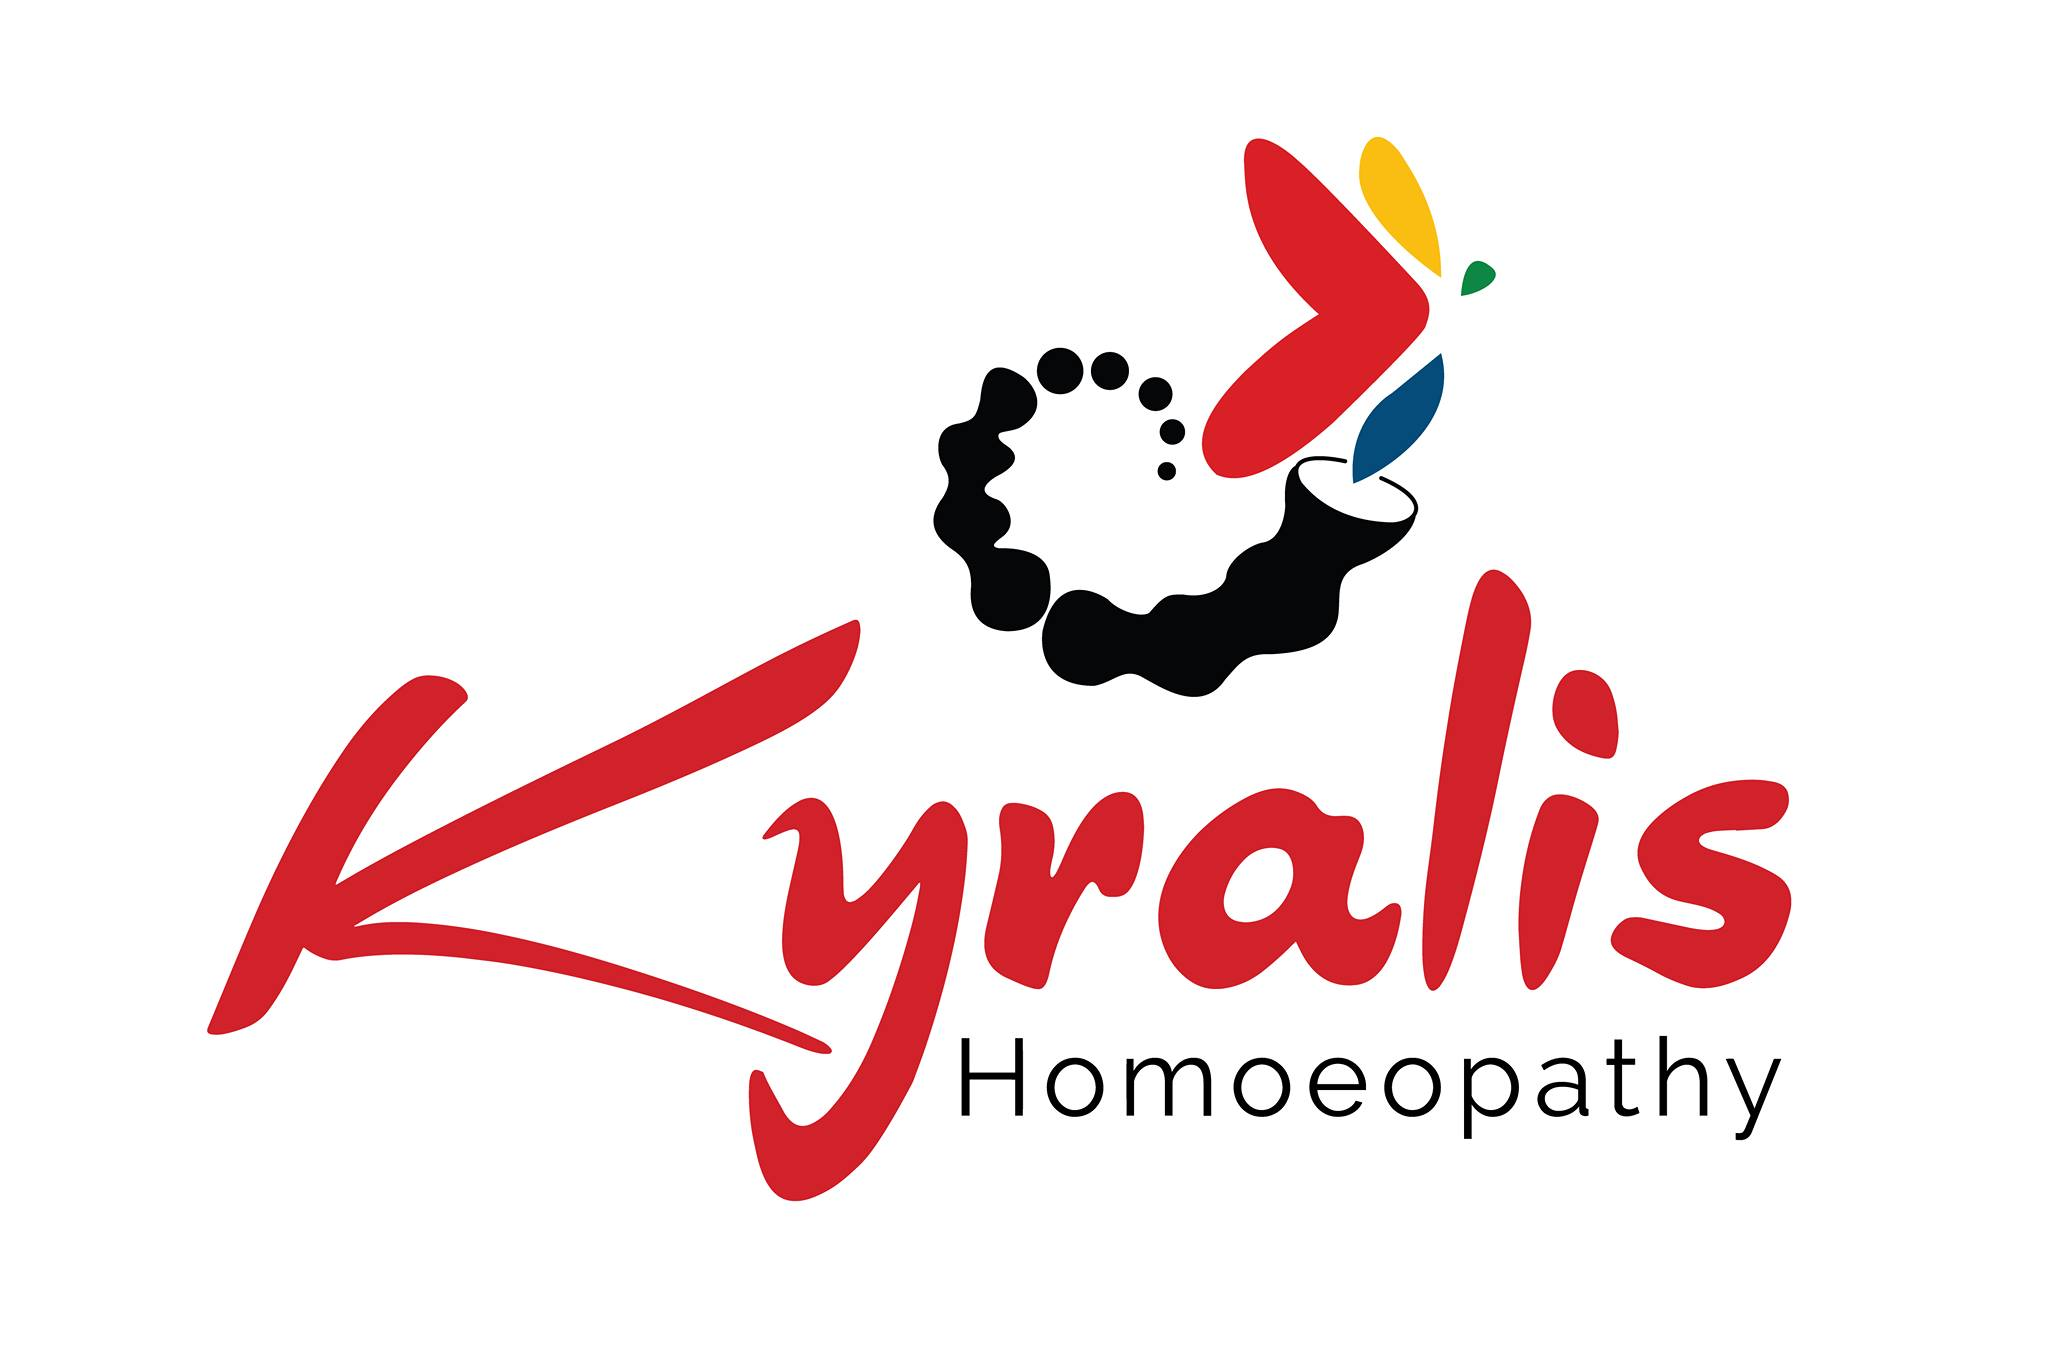 Kyralis Homoeopathy